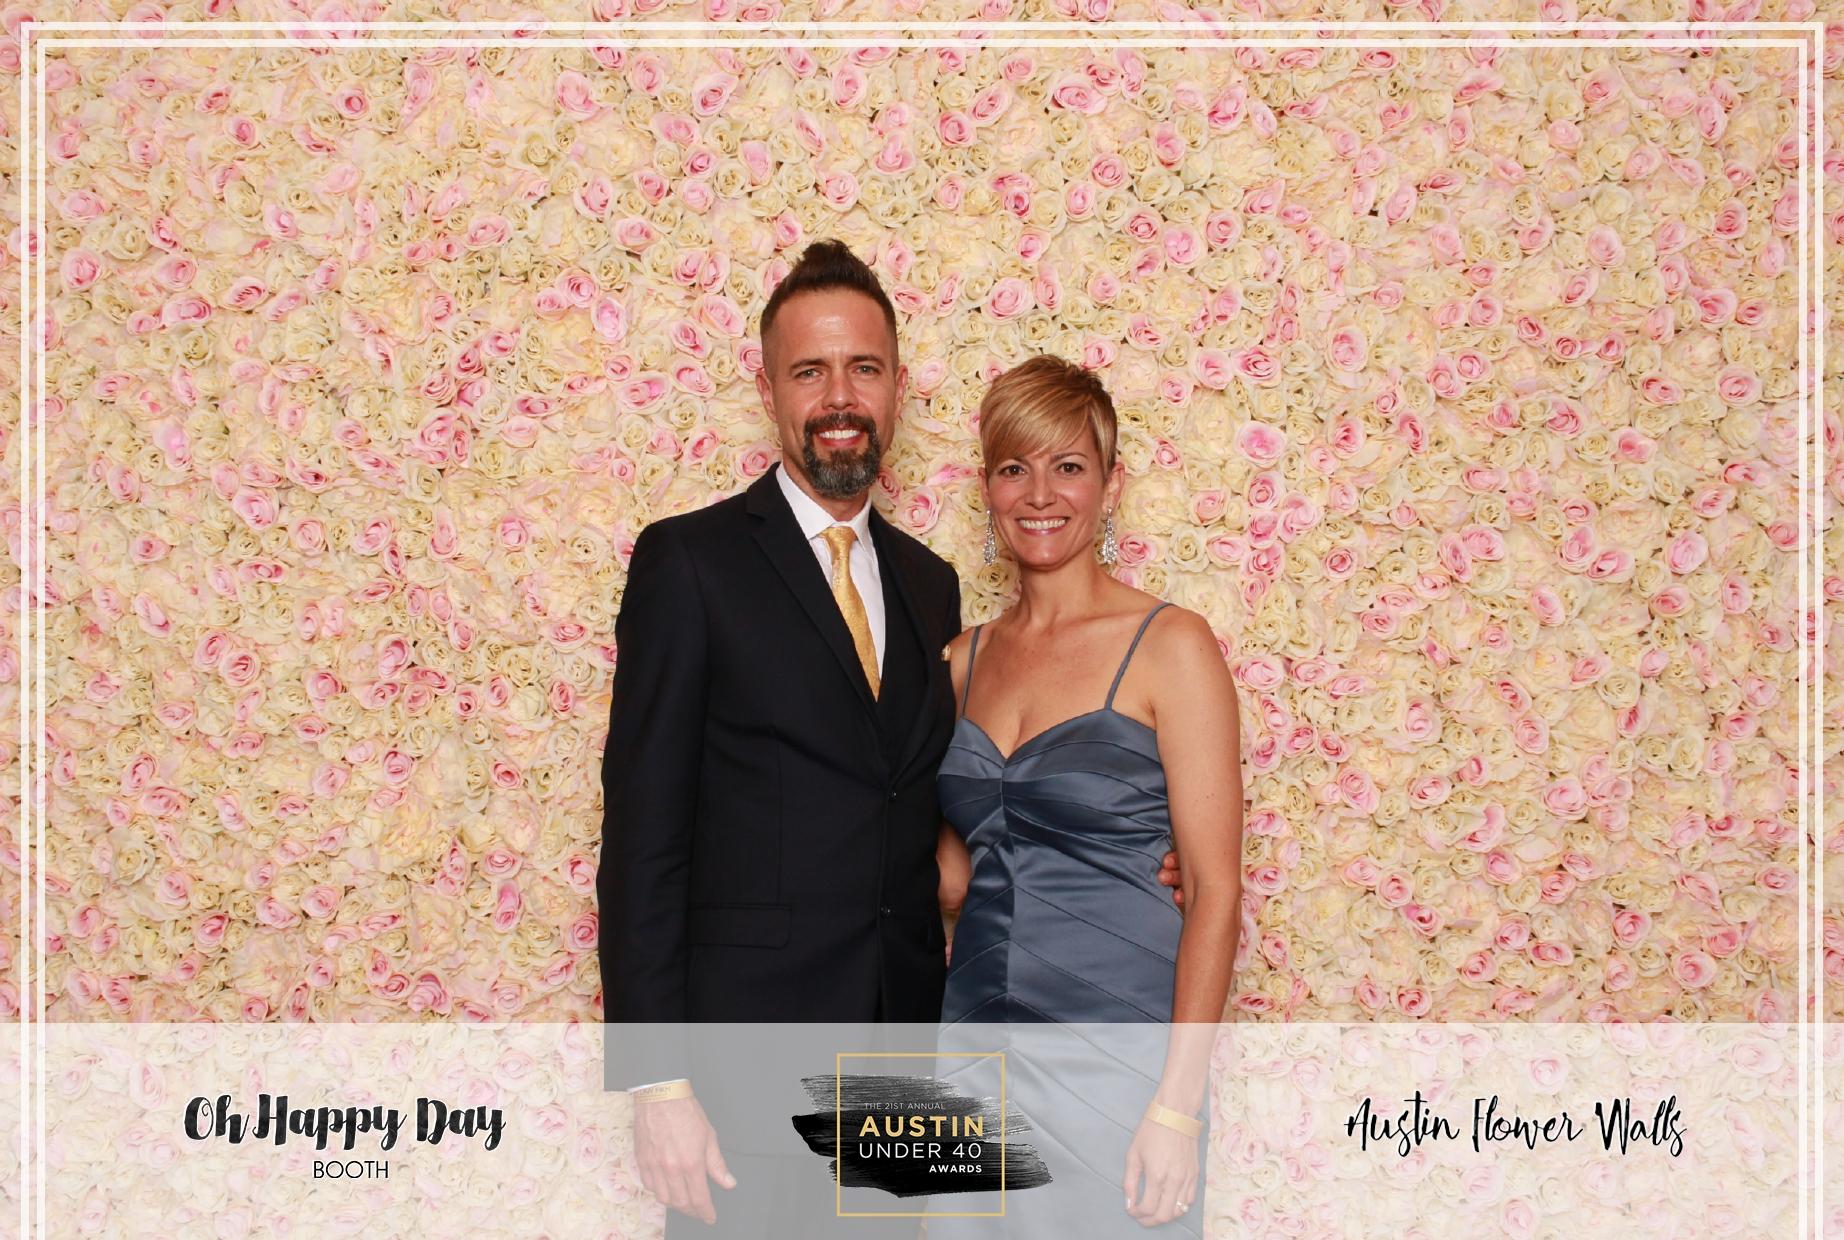 Oh Happy Day Booth - Austin Under 40-87.jpg